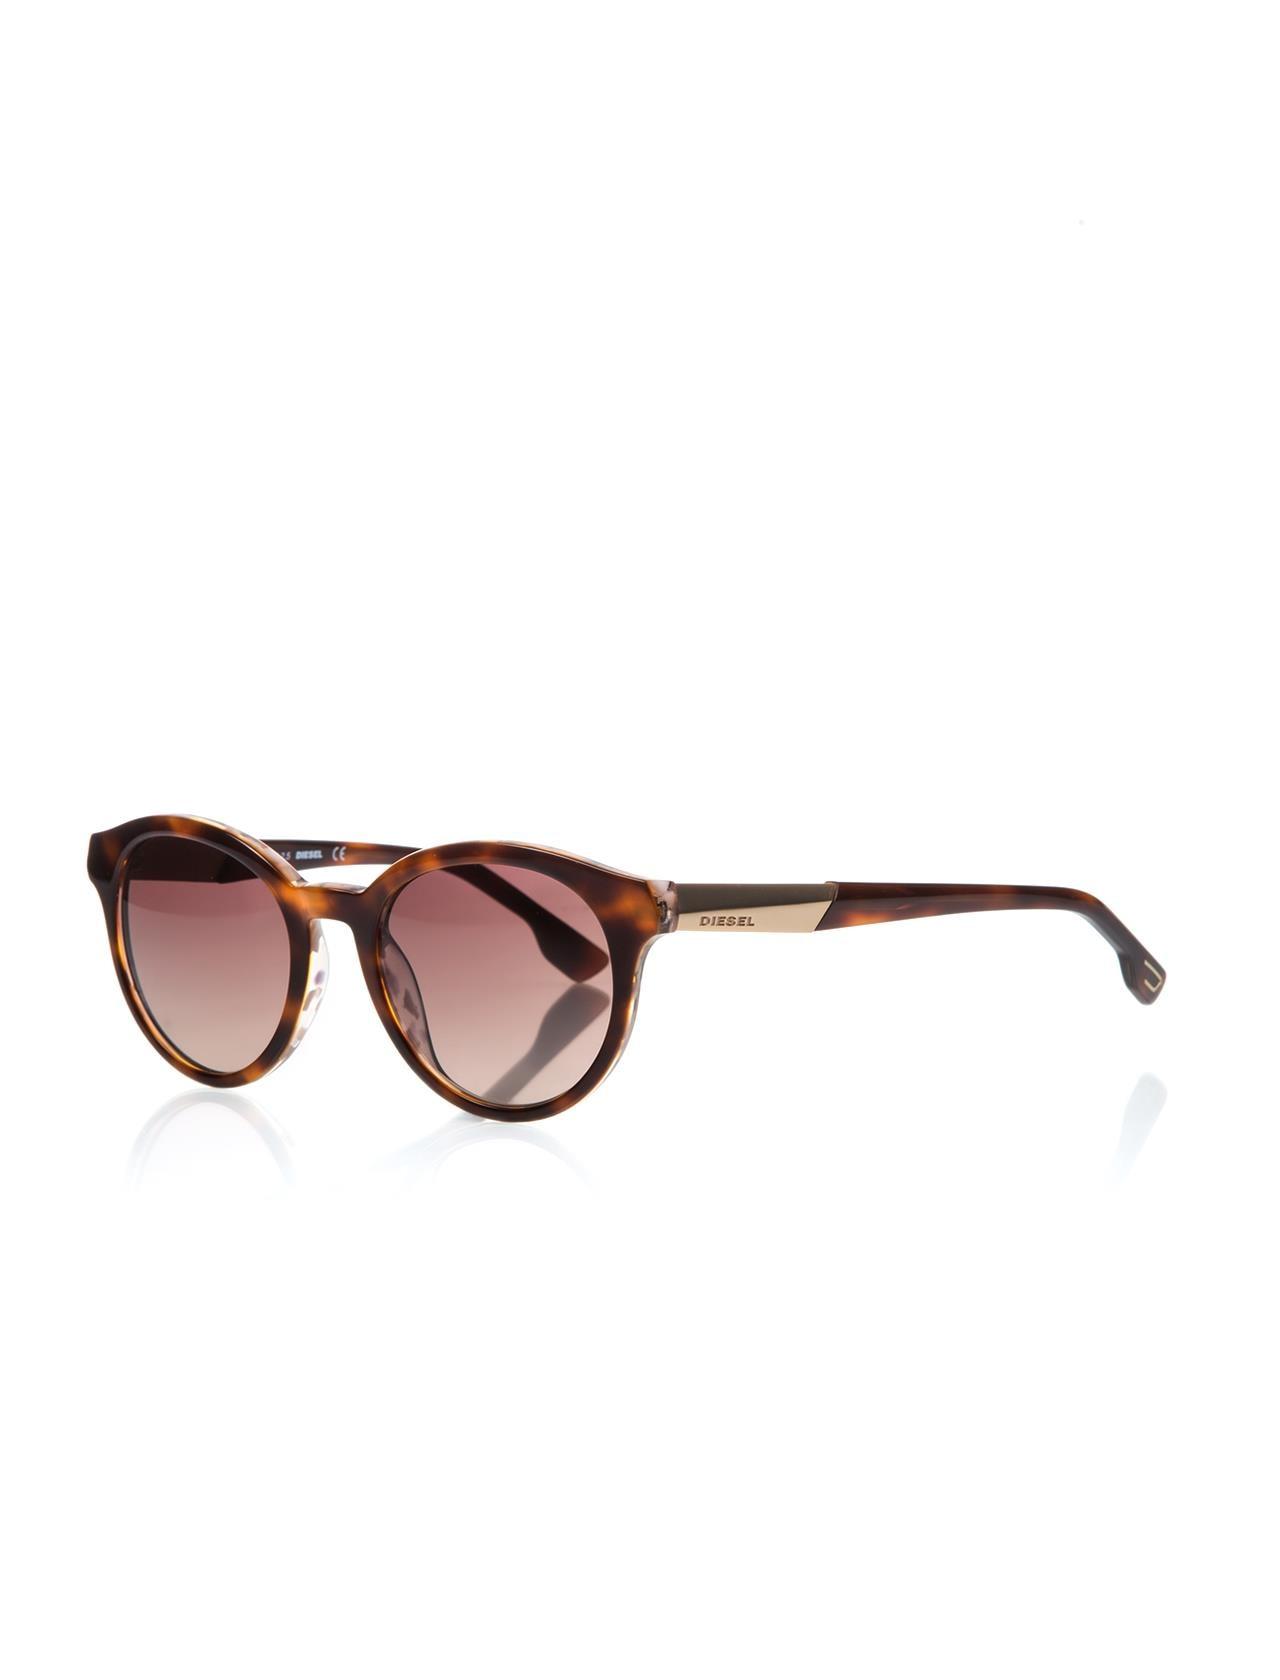 Unisex sunglasses dl 0186 56f bone Brown organic oval aval 51-20-145 diesel